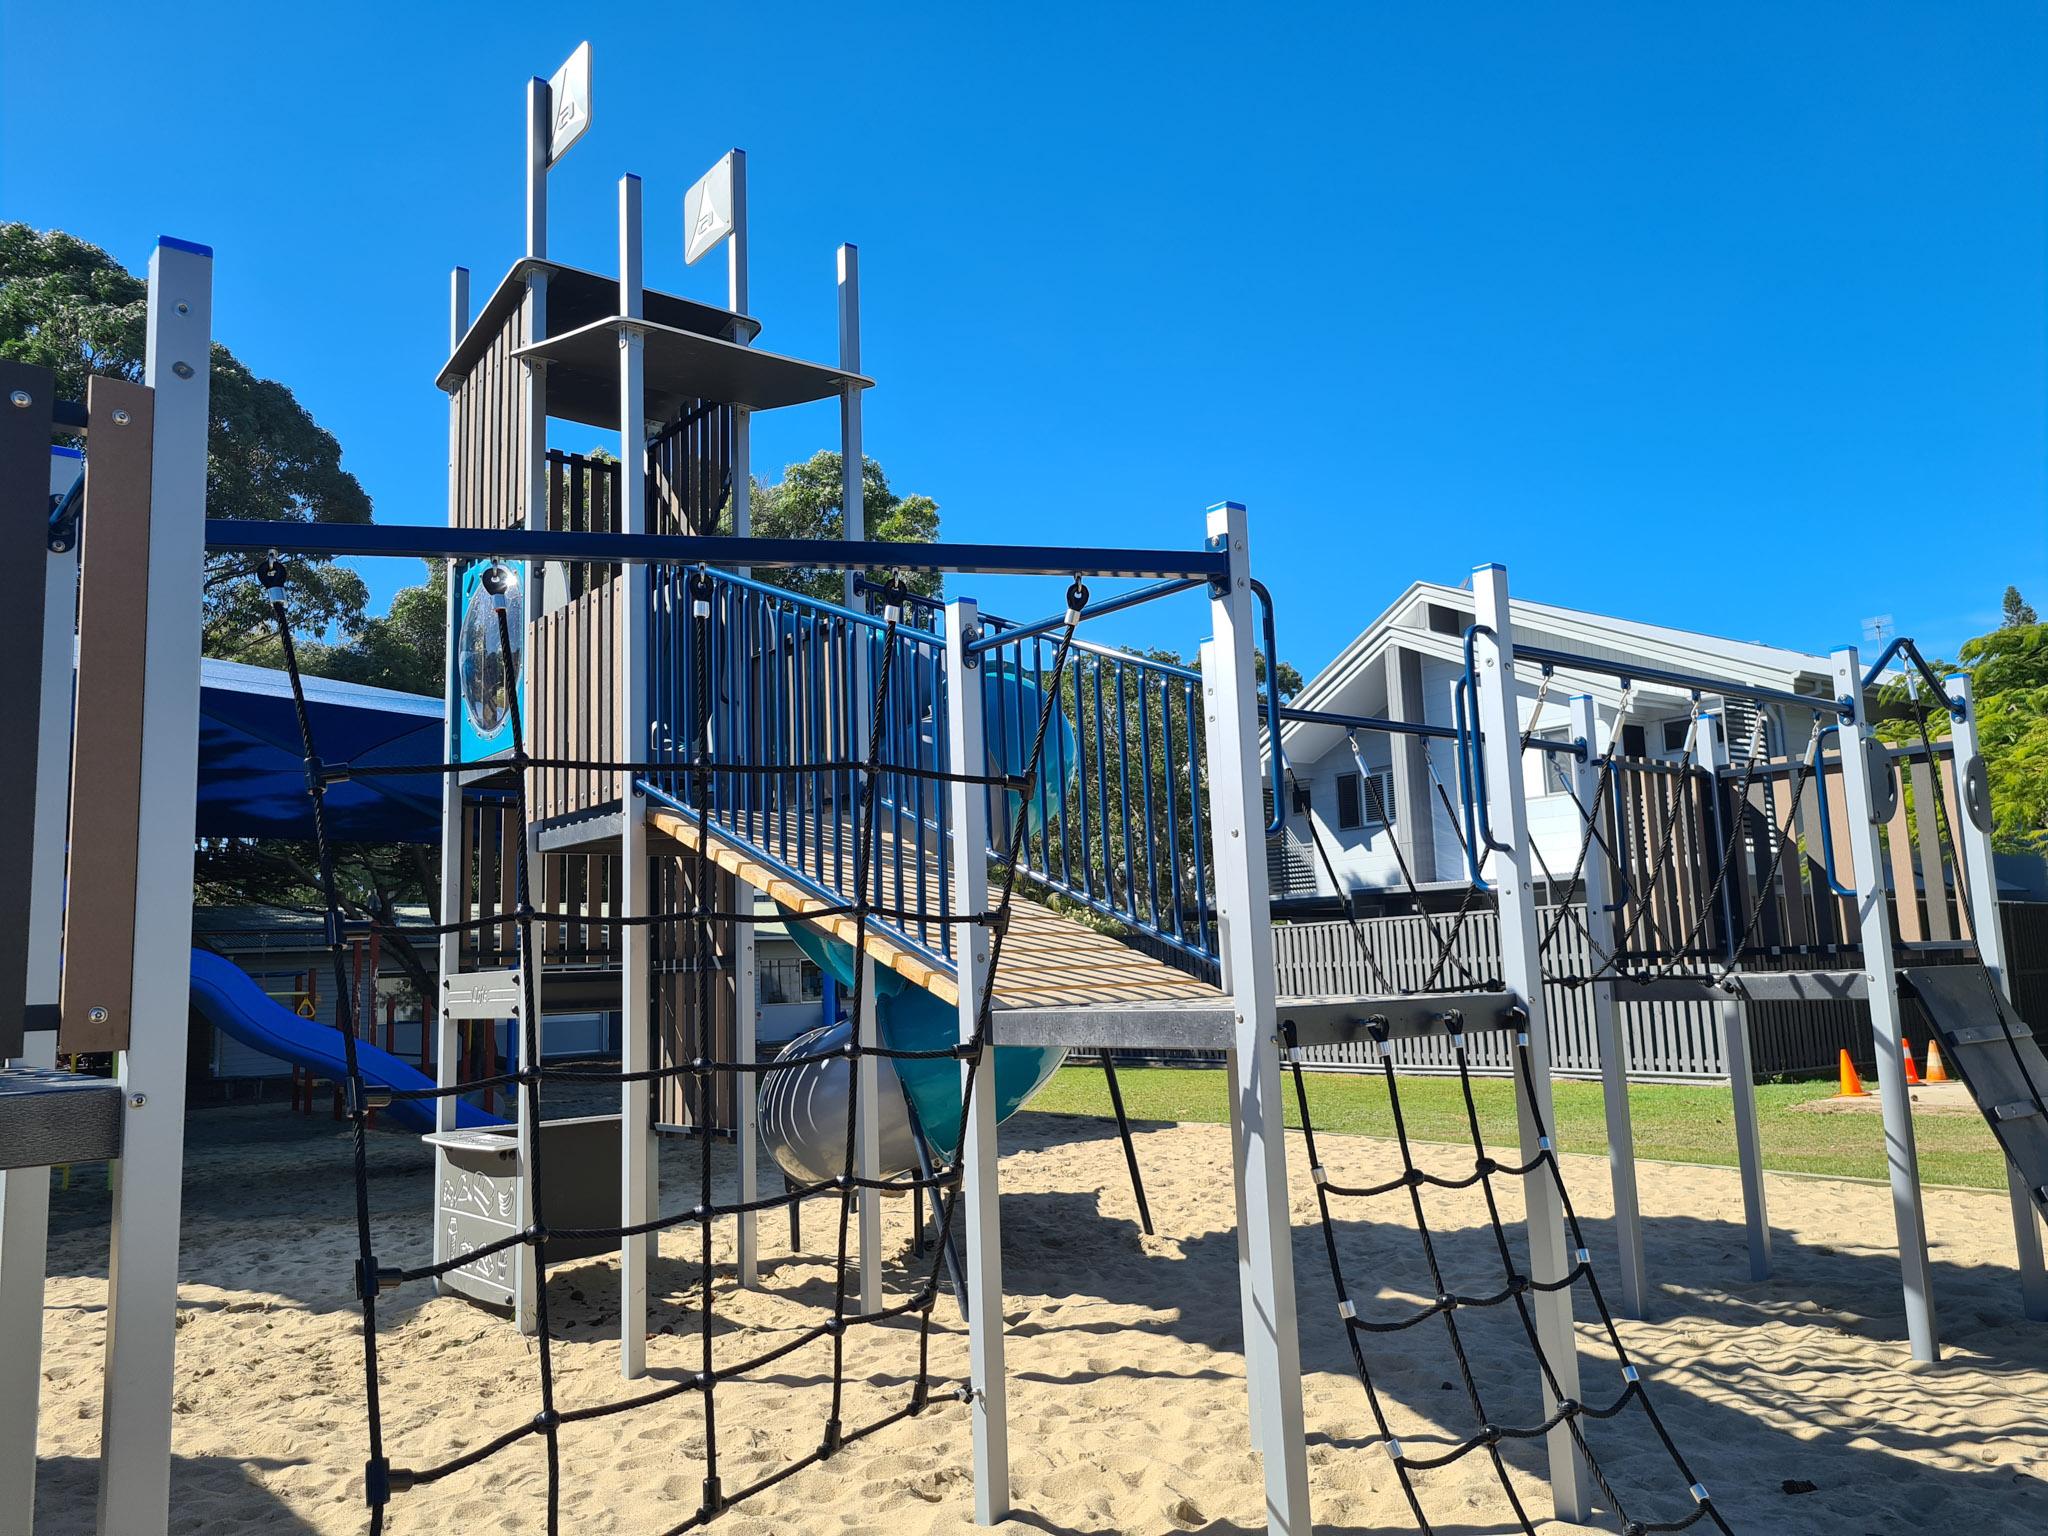 palm-beach-state-school-playrground-austek-play-12